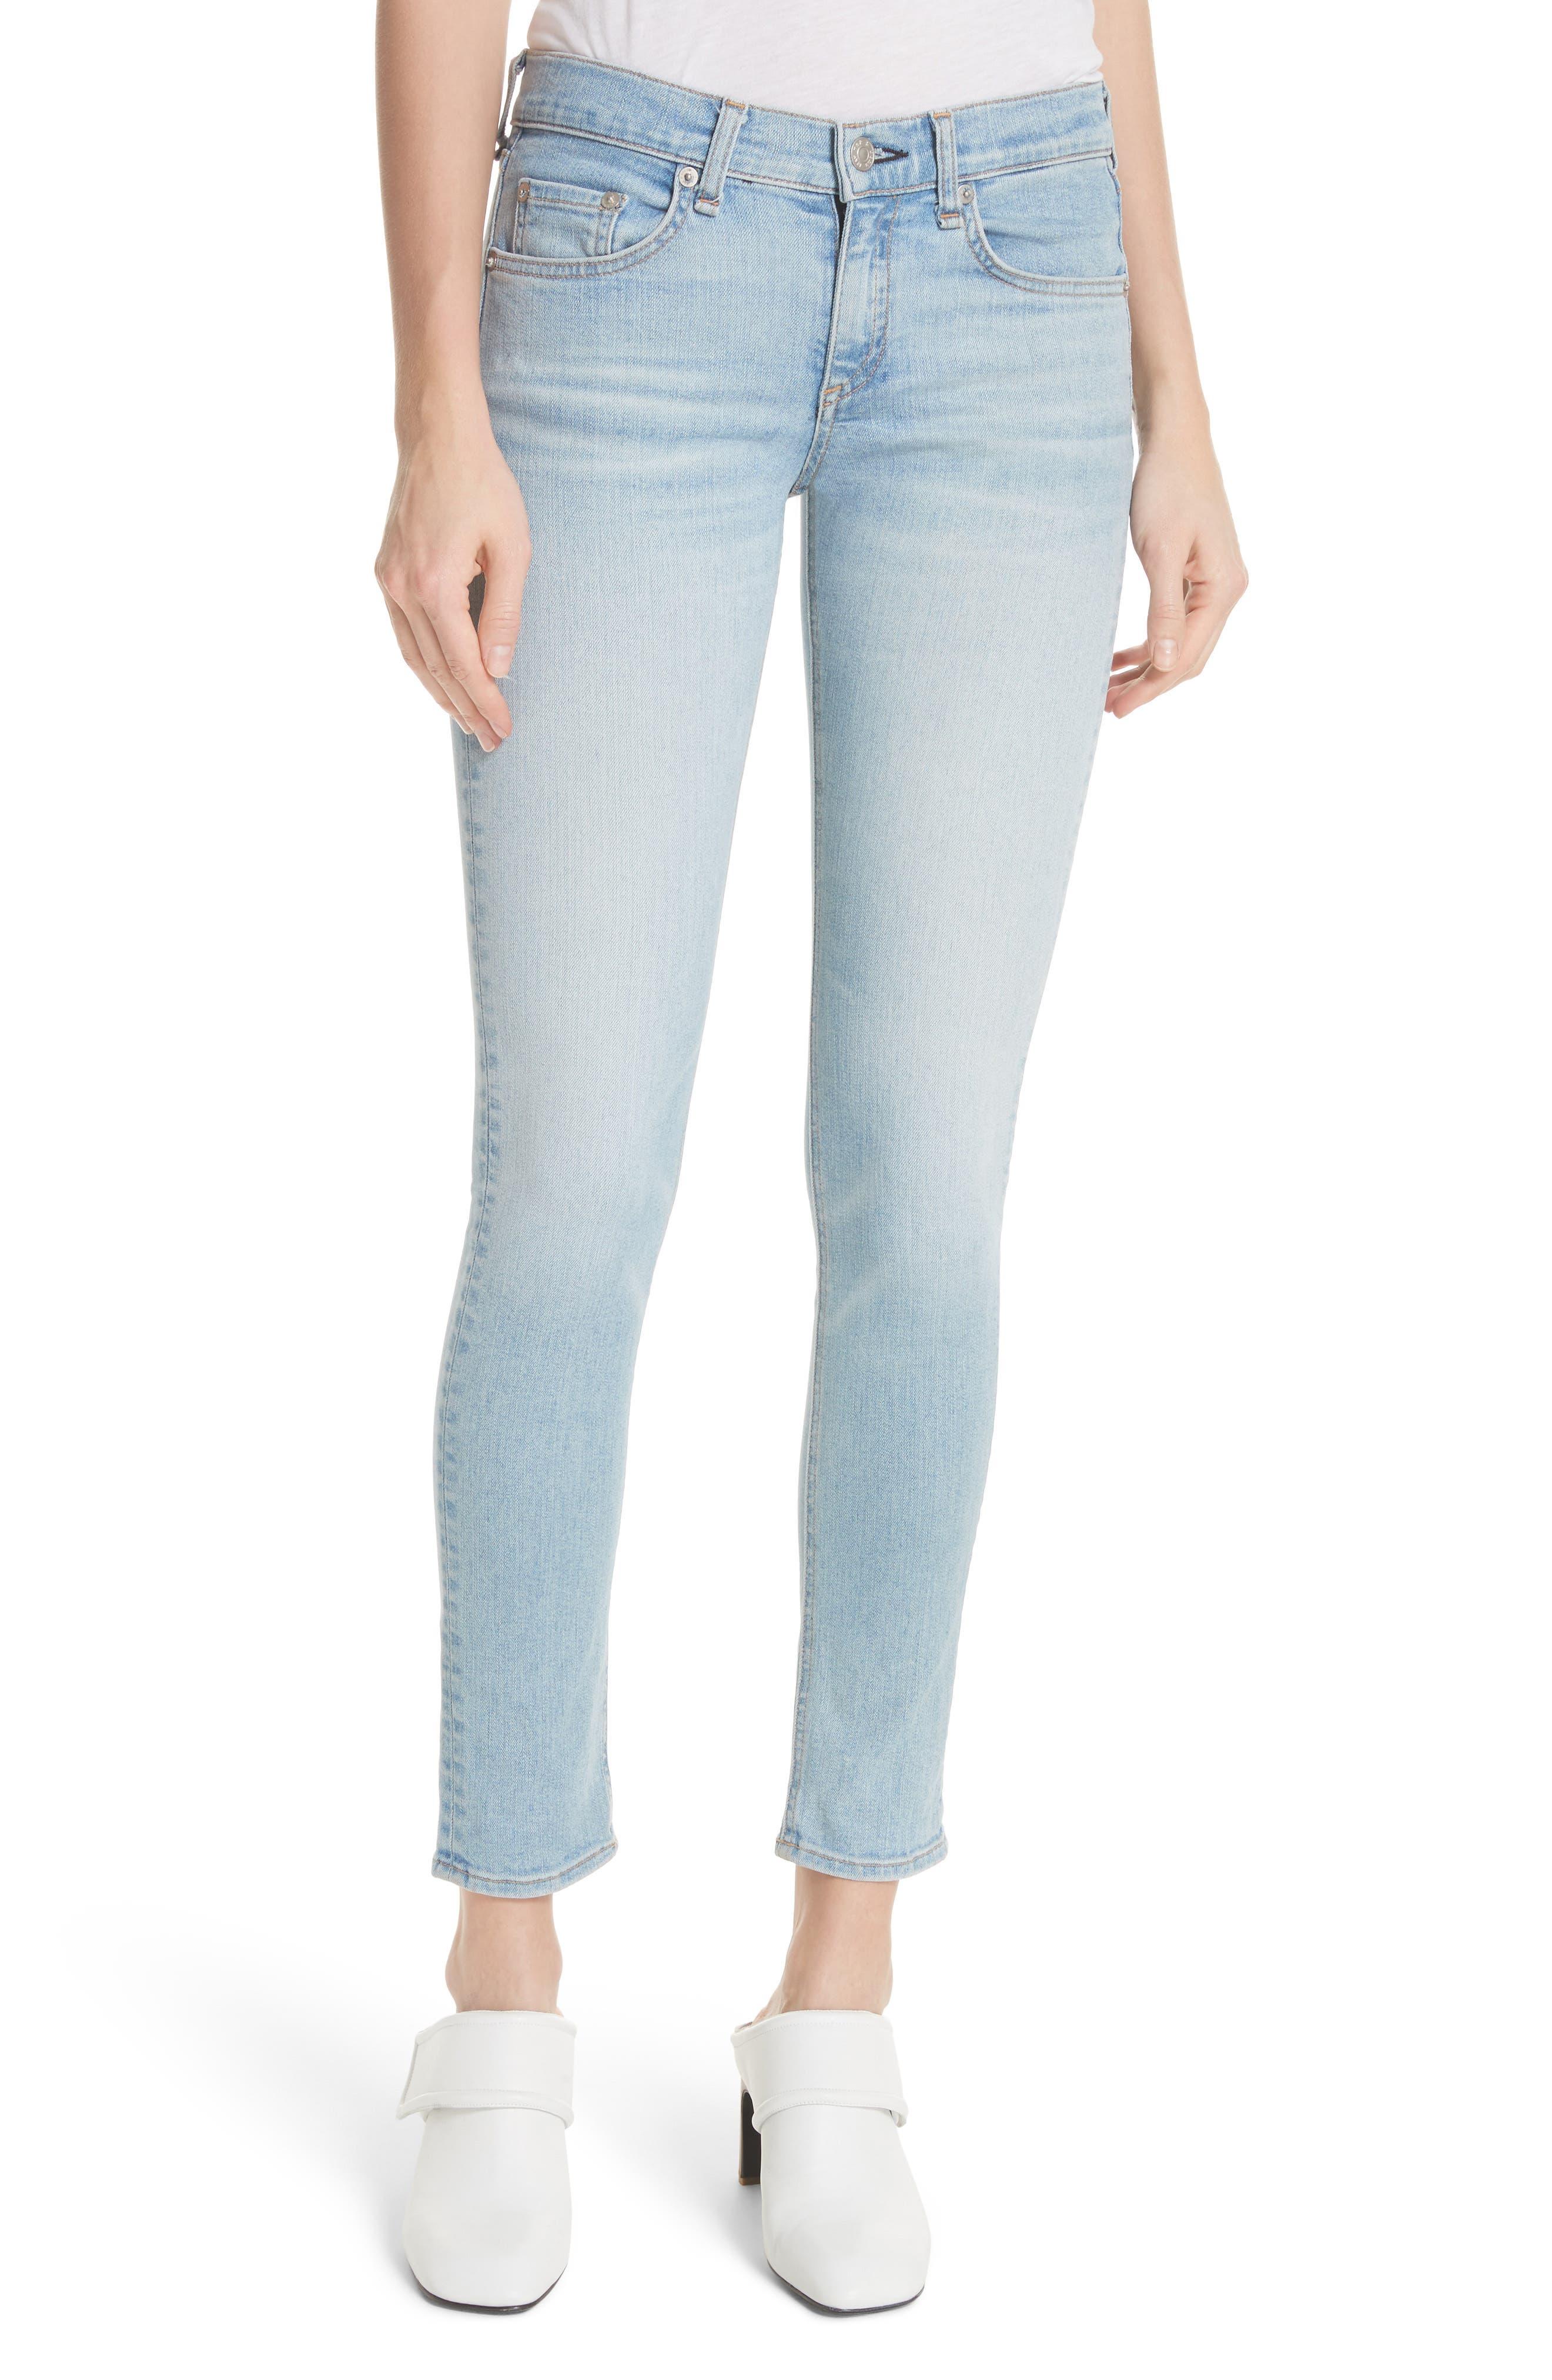 Main Image - rag & bone/JEAN Ankle Skinny Jeans (Nelly)